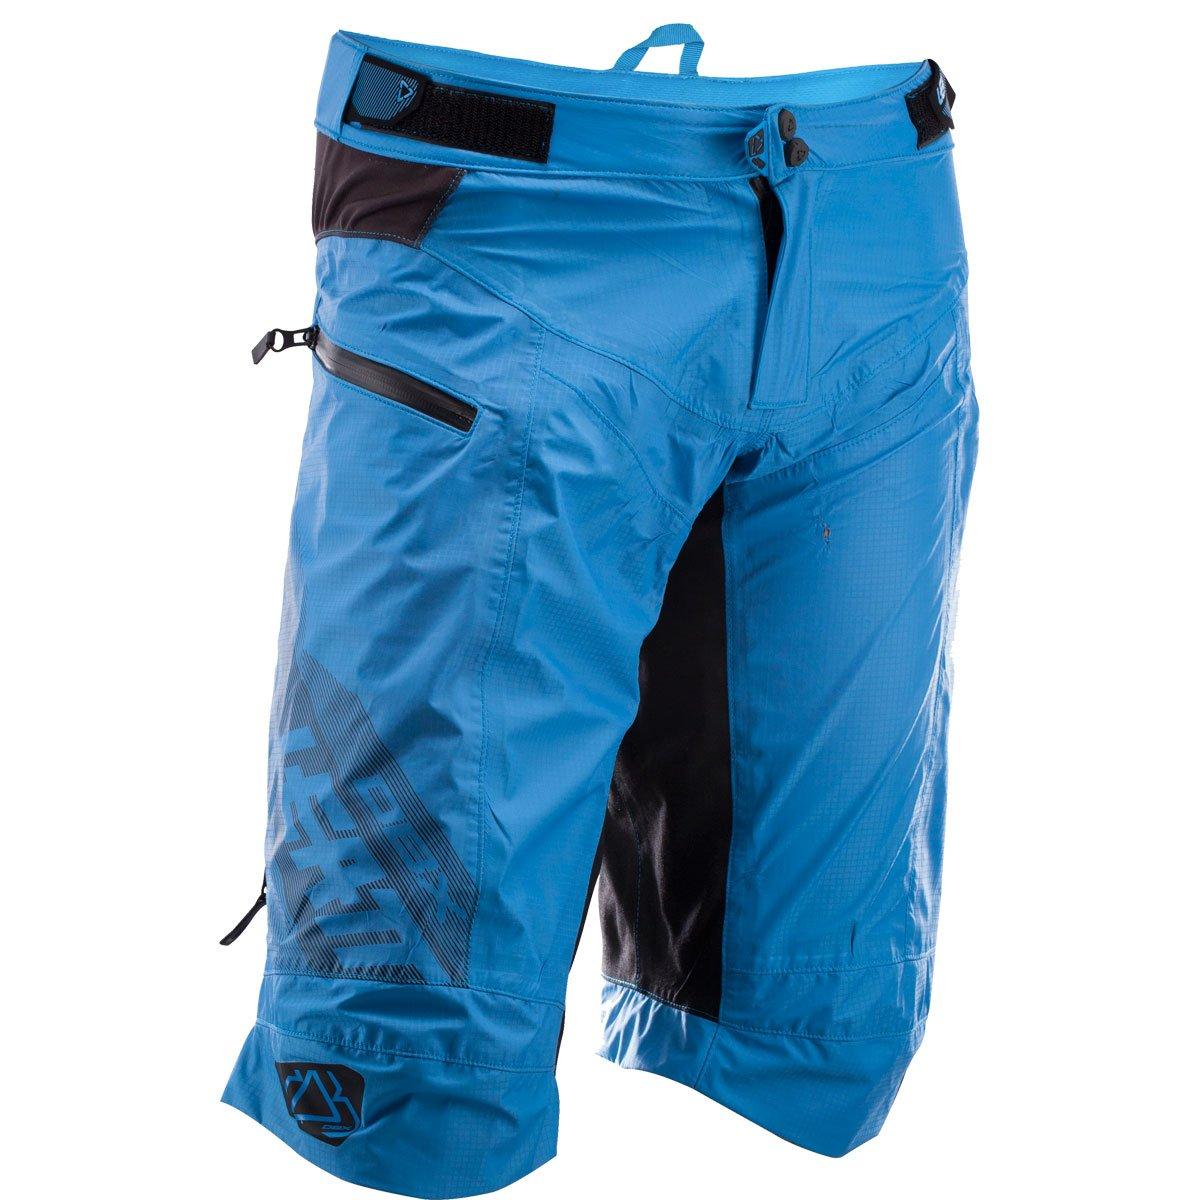 Leatt DBX 5.0 Adult BMX Sports Shorts - Blue / Size 28